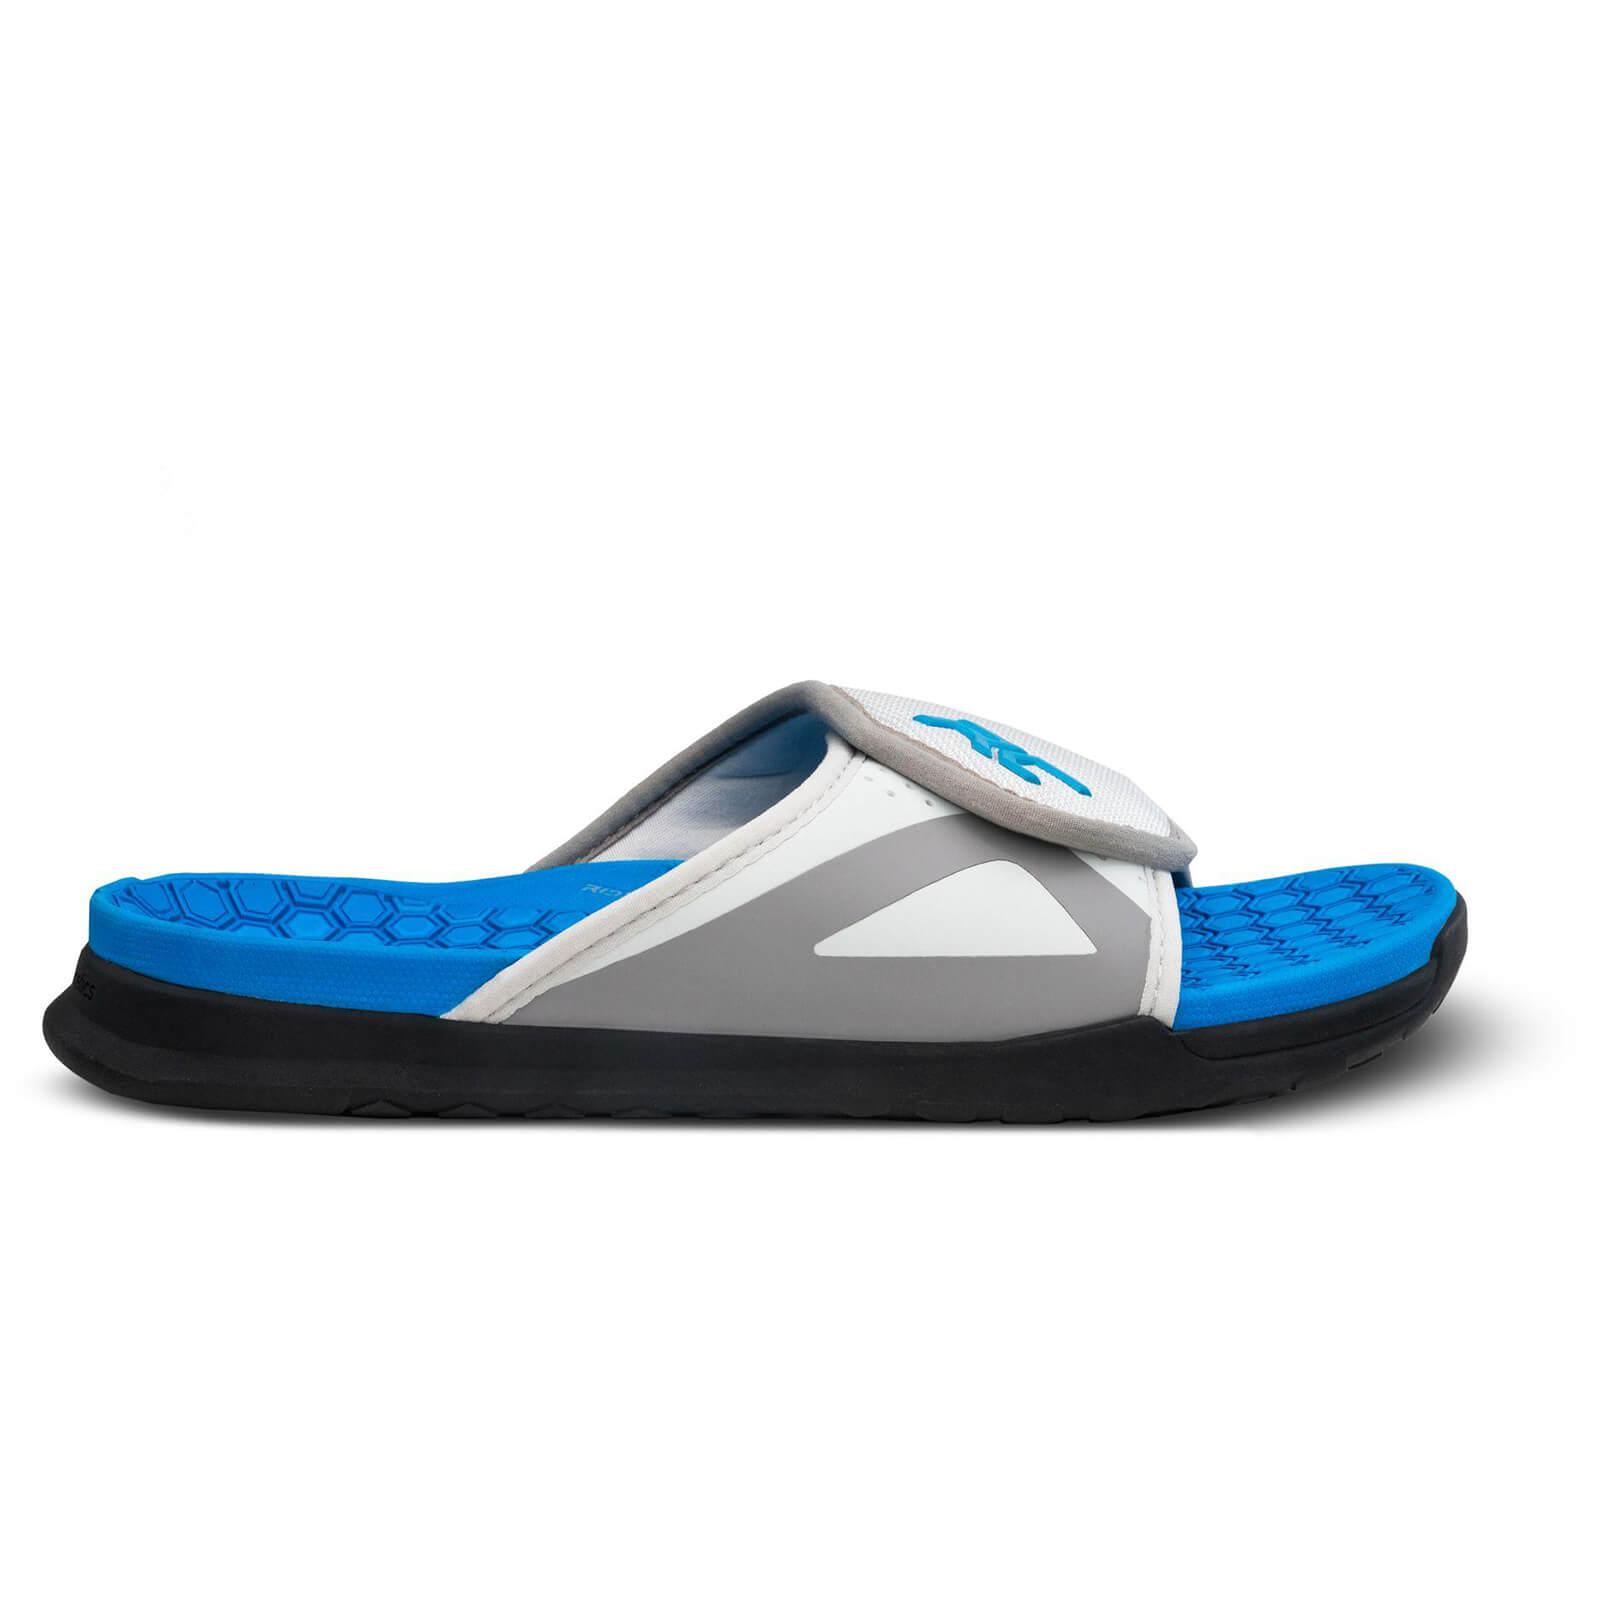 Ride Concepts Coaster Women's Shoes - UK 6/EU 37 - Light Grey/Blue